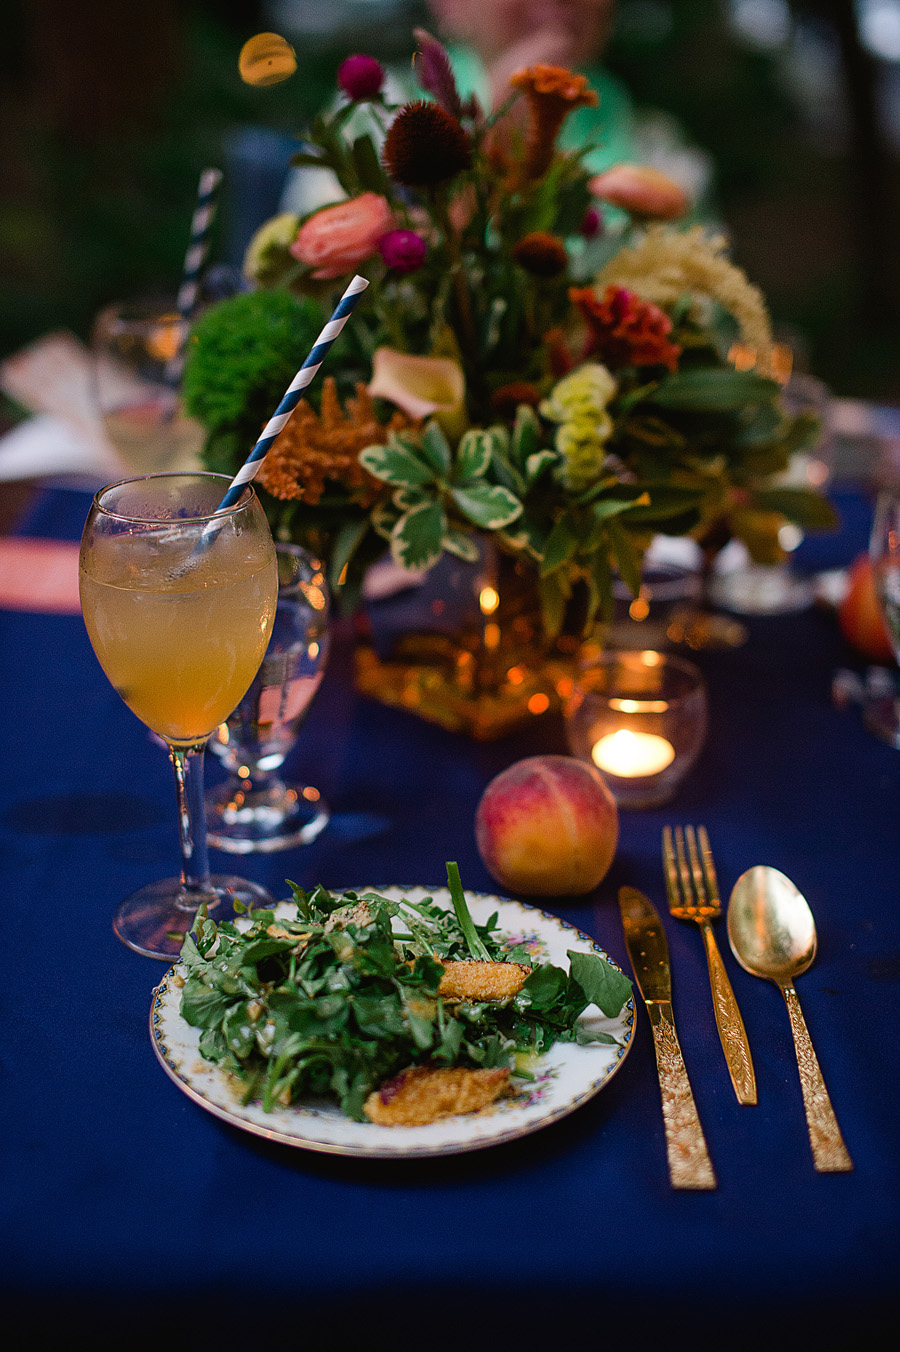 West-Chester-PA-Faunbrook-Harvest-Dinner-Series-Peach-AlexandraWhitney-1180.jpg